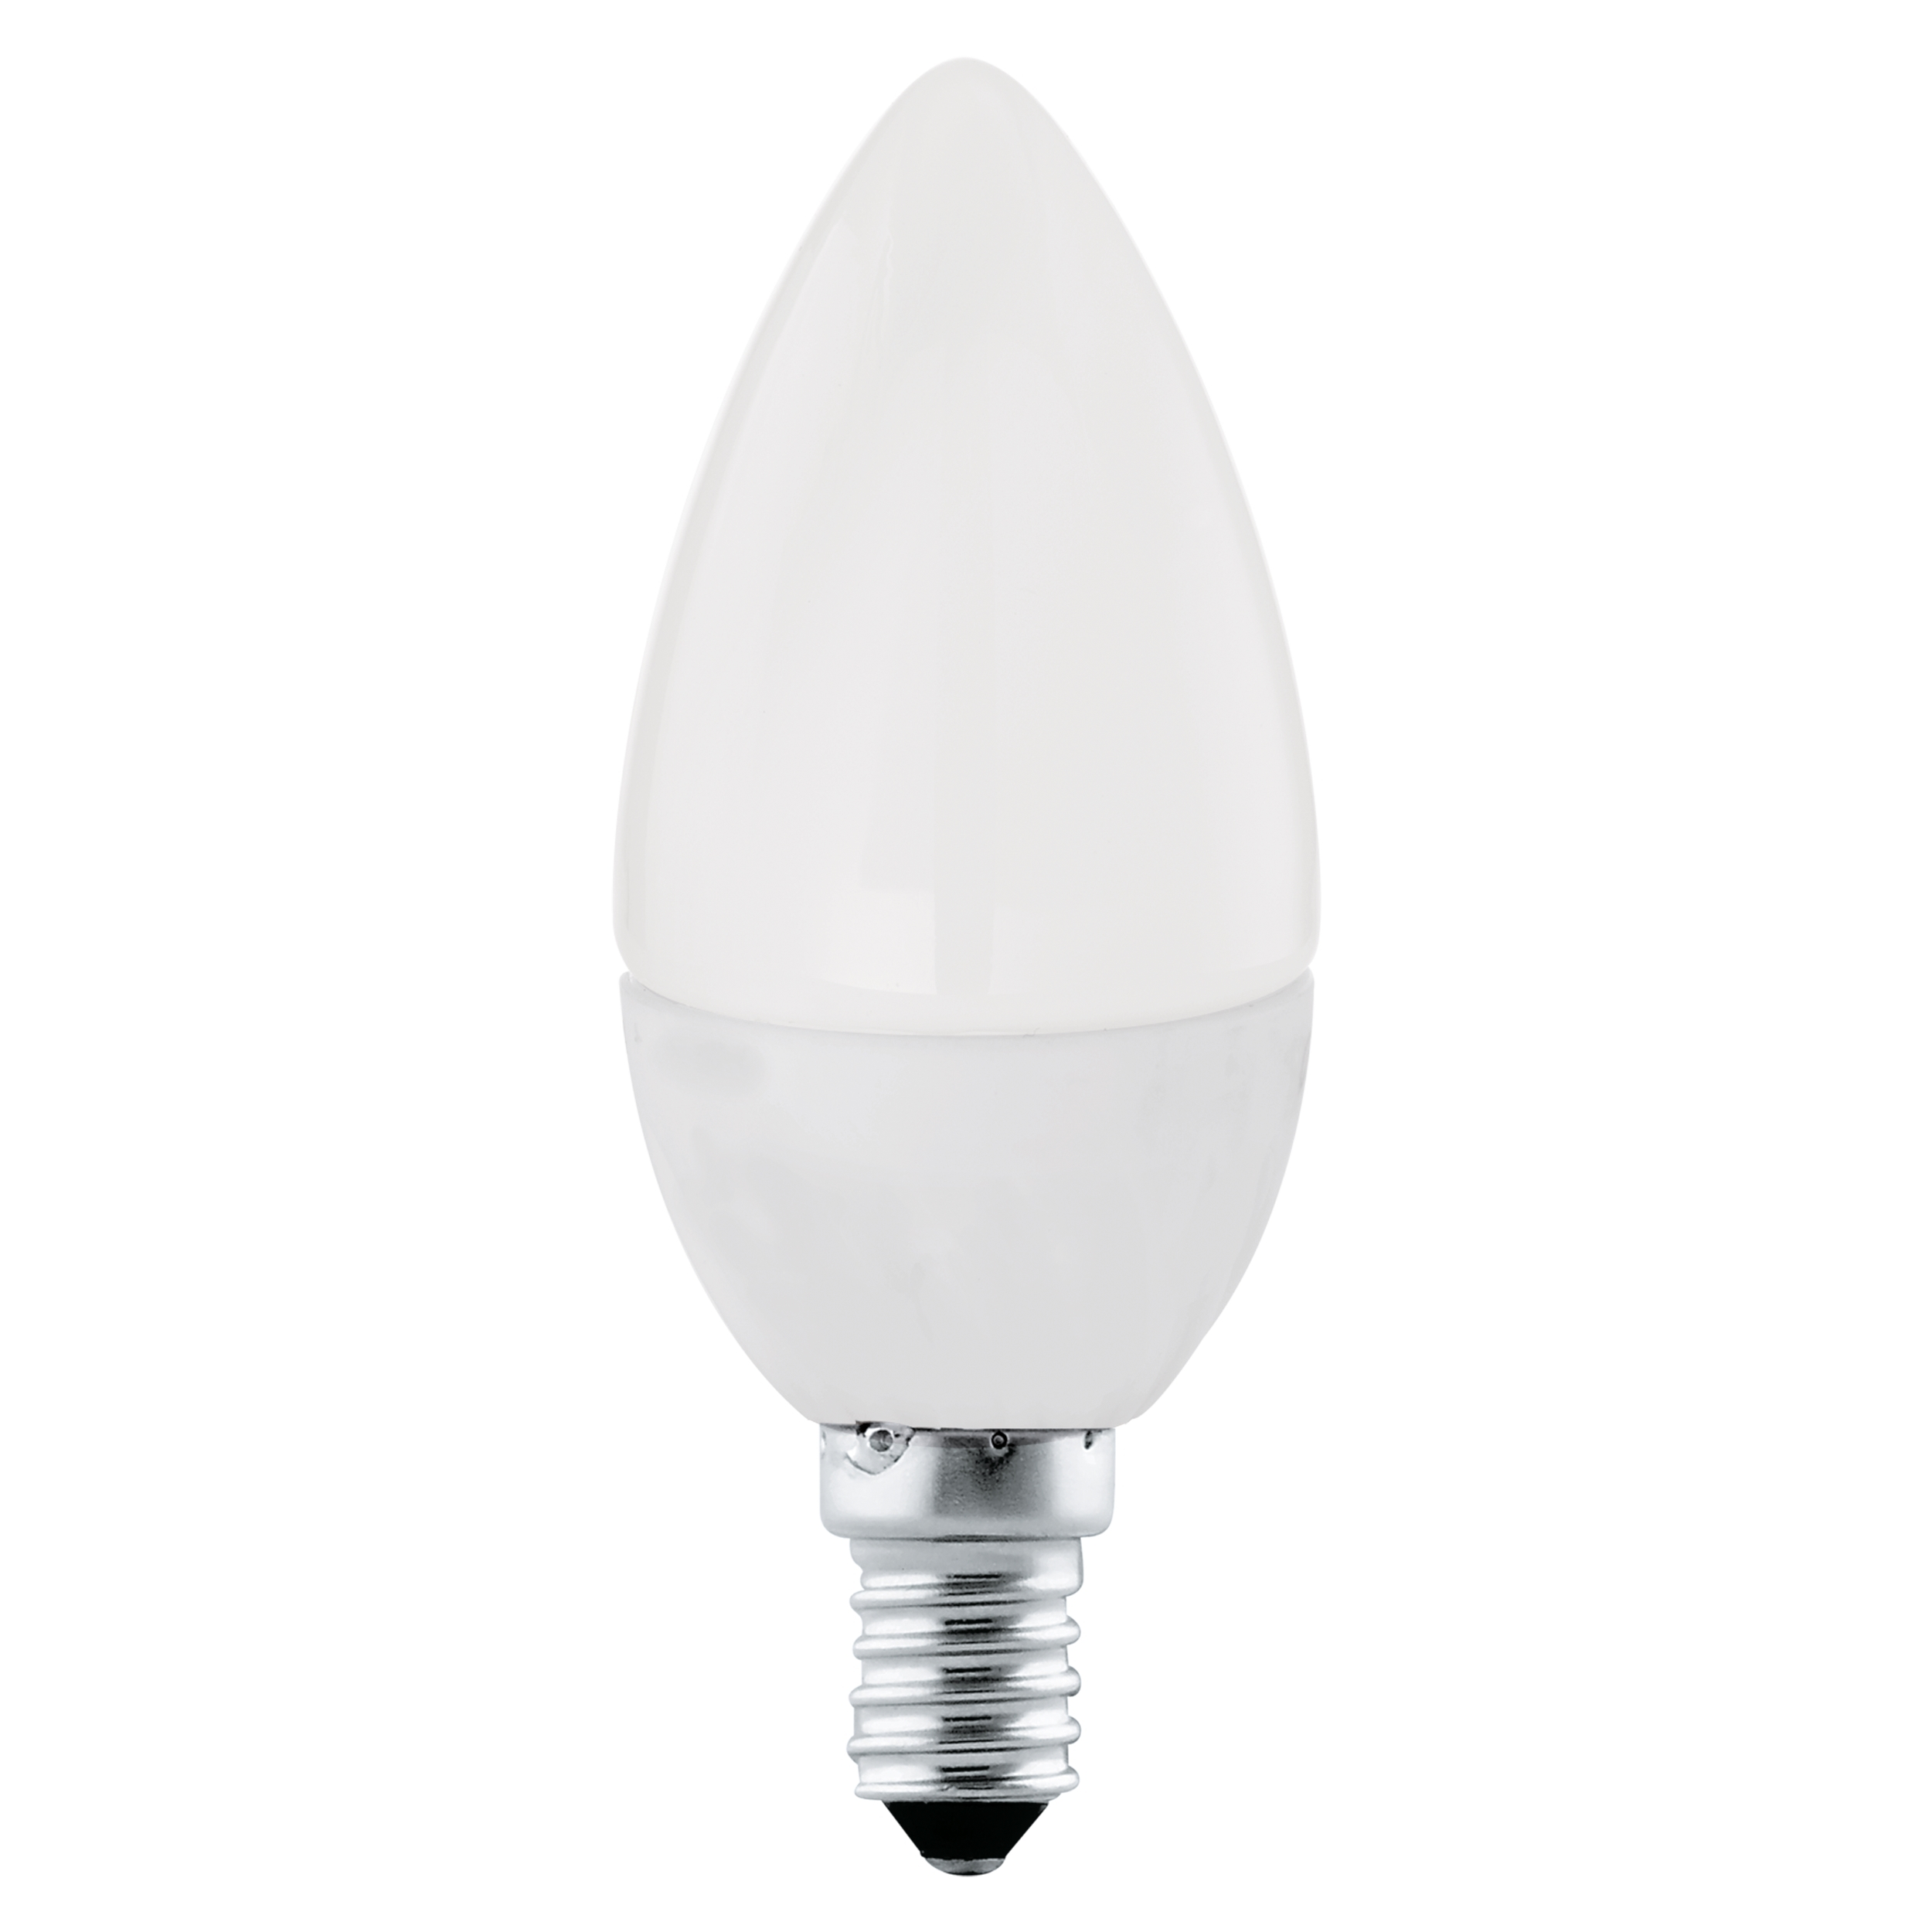 Bec LED Eglo 10766 E14 4W 320 lumeni 4000K 15.000 ore alb neutru poza